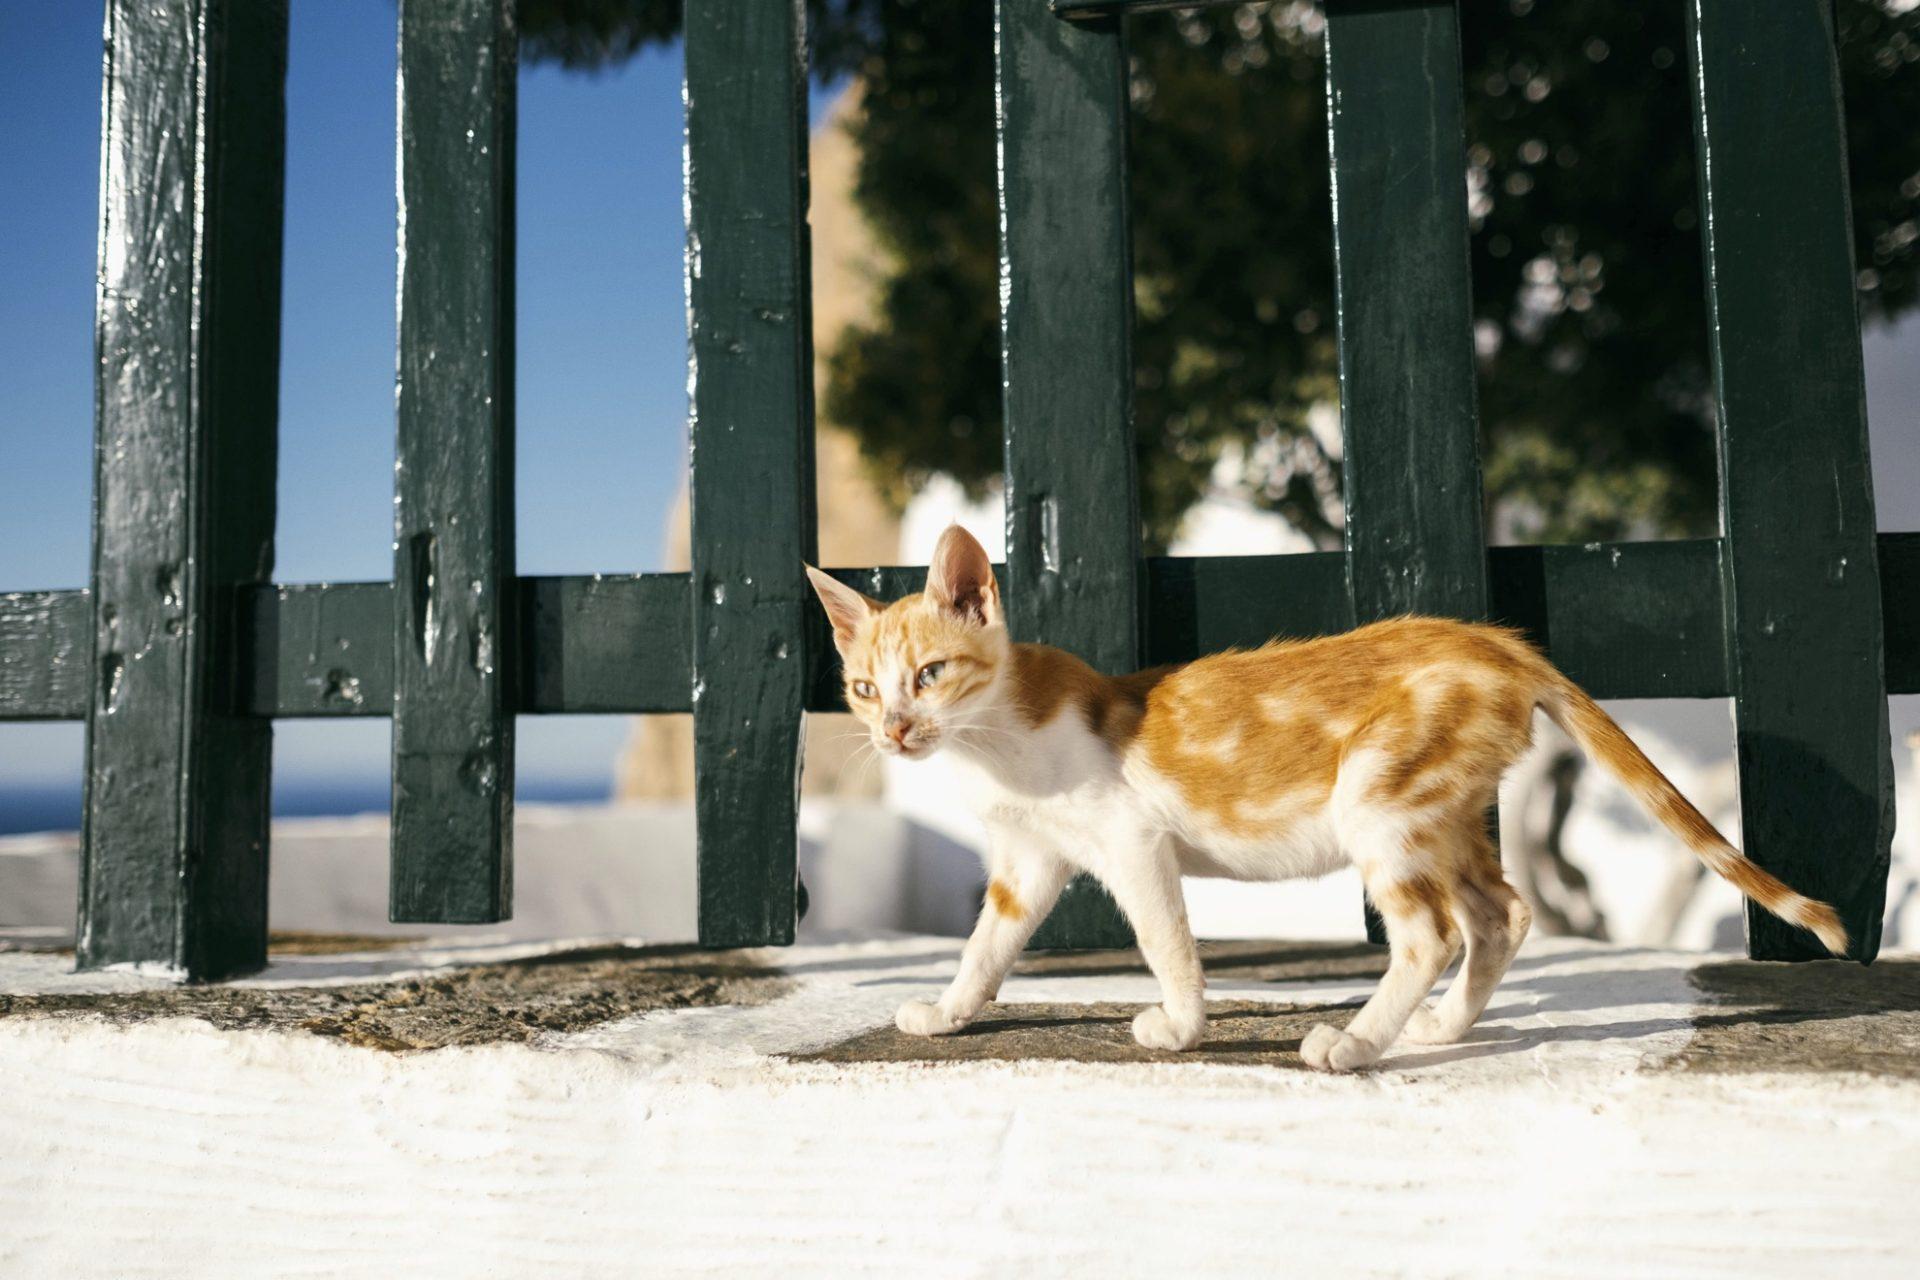 chats grecs@laurentparienti - 16